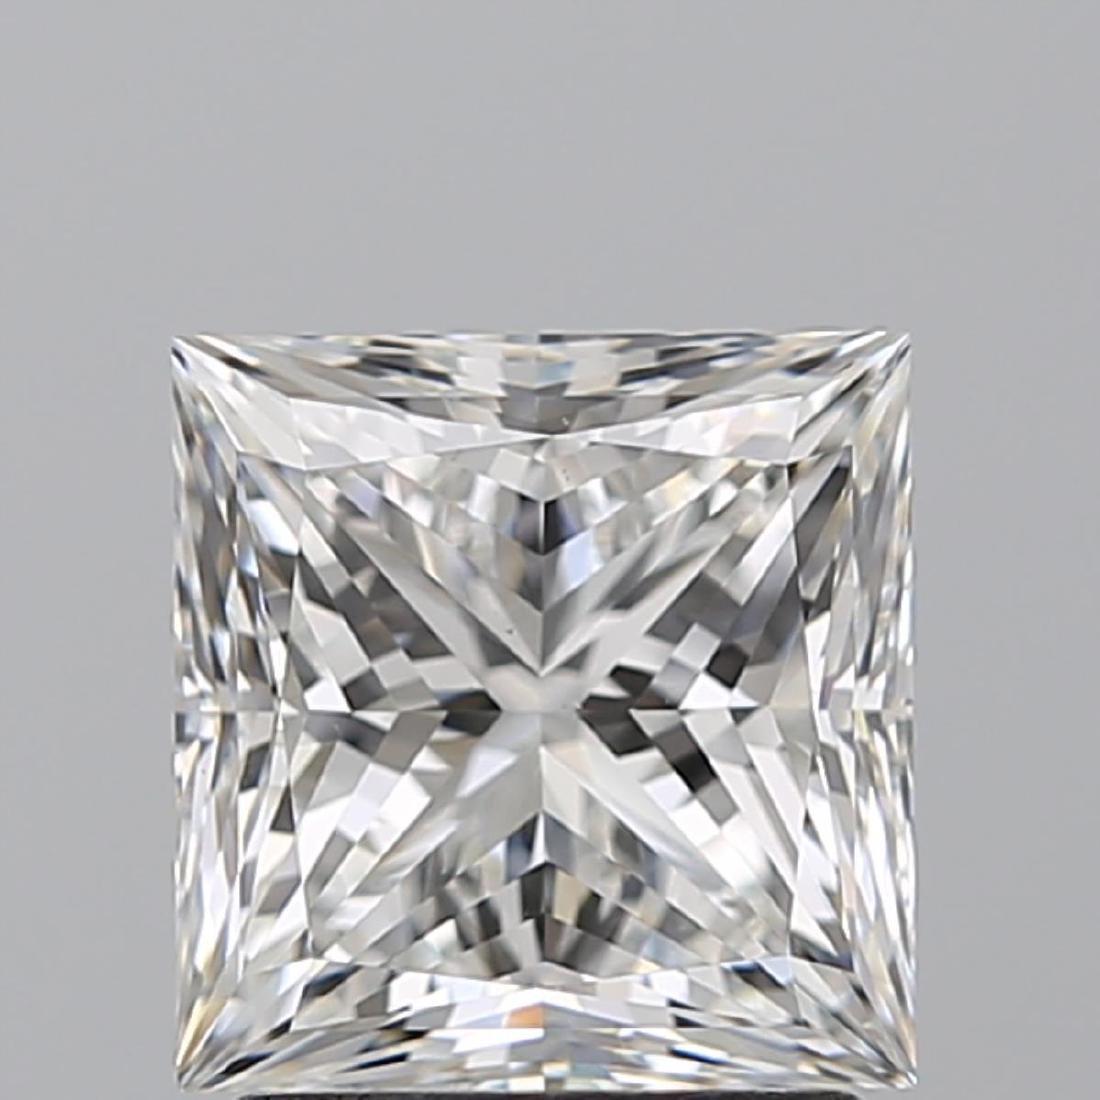 2.01 ct, Color F/VS2, Princess cut Diamond - 2